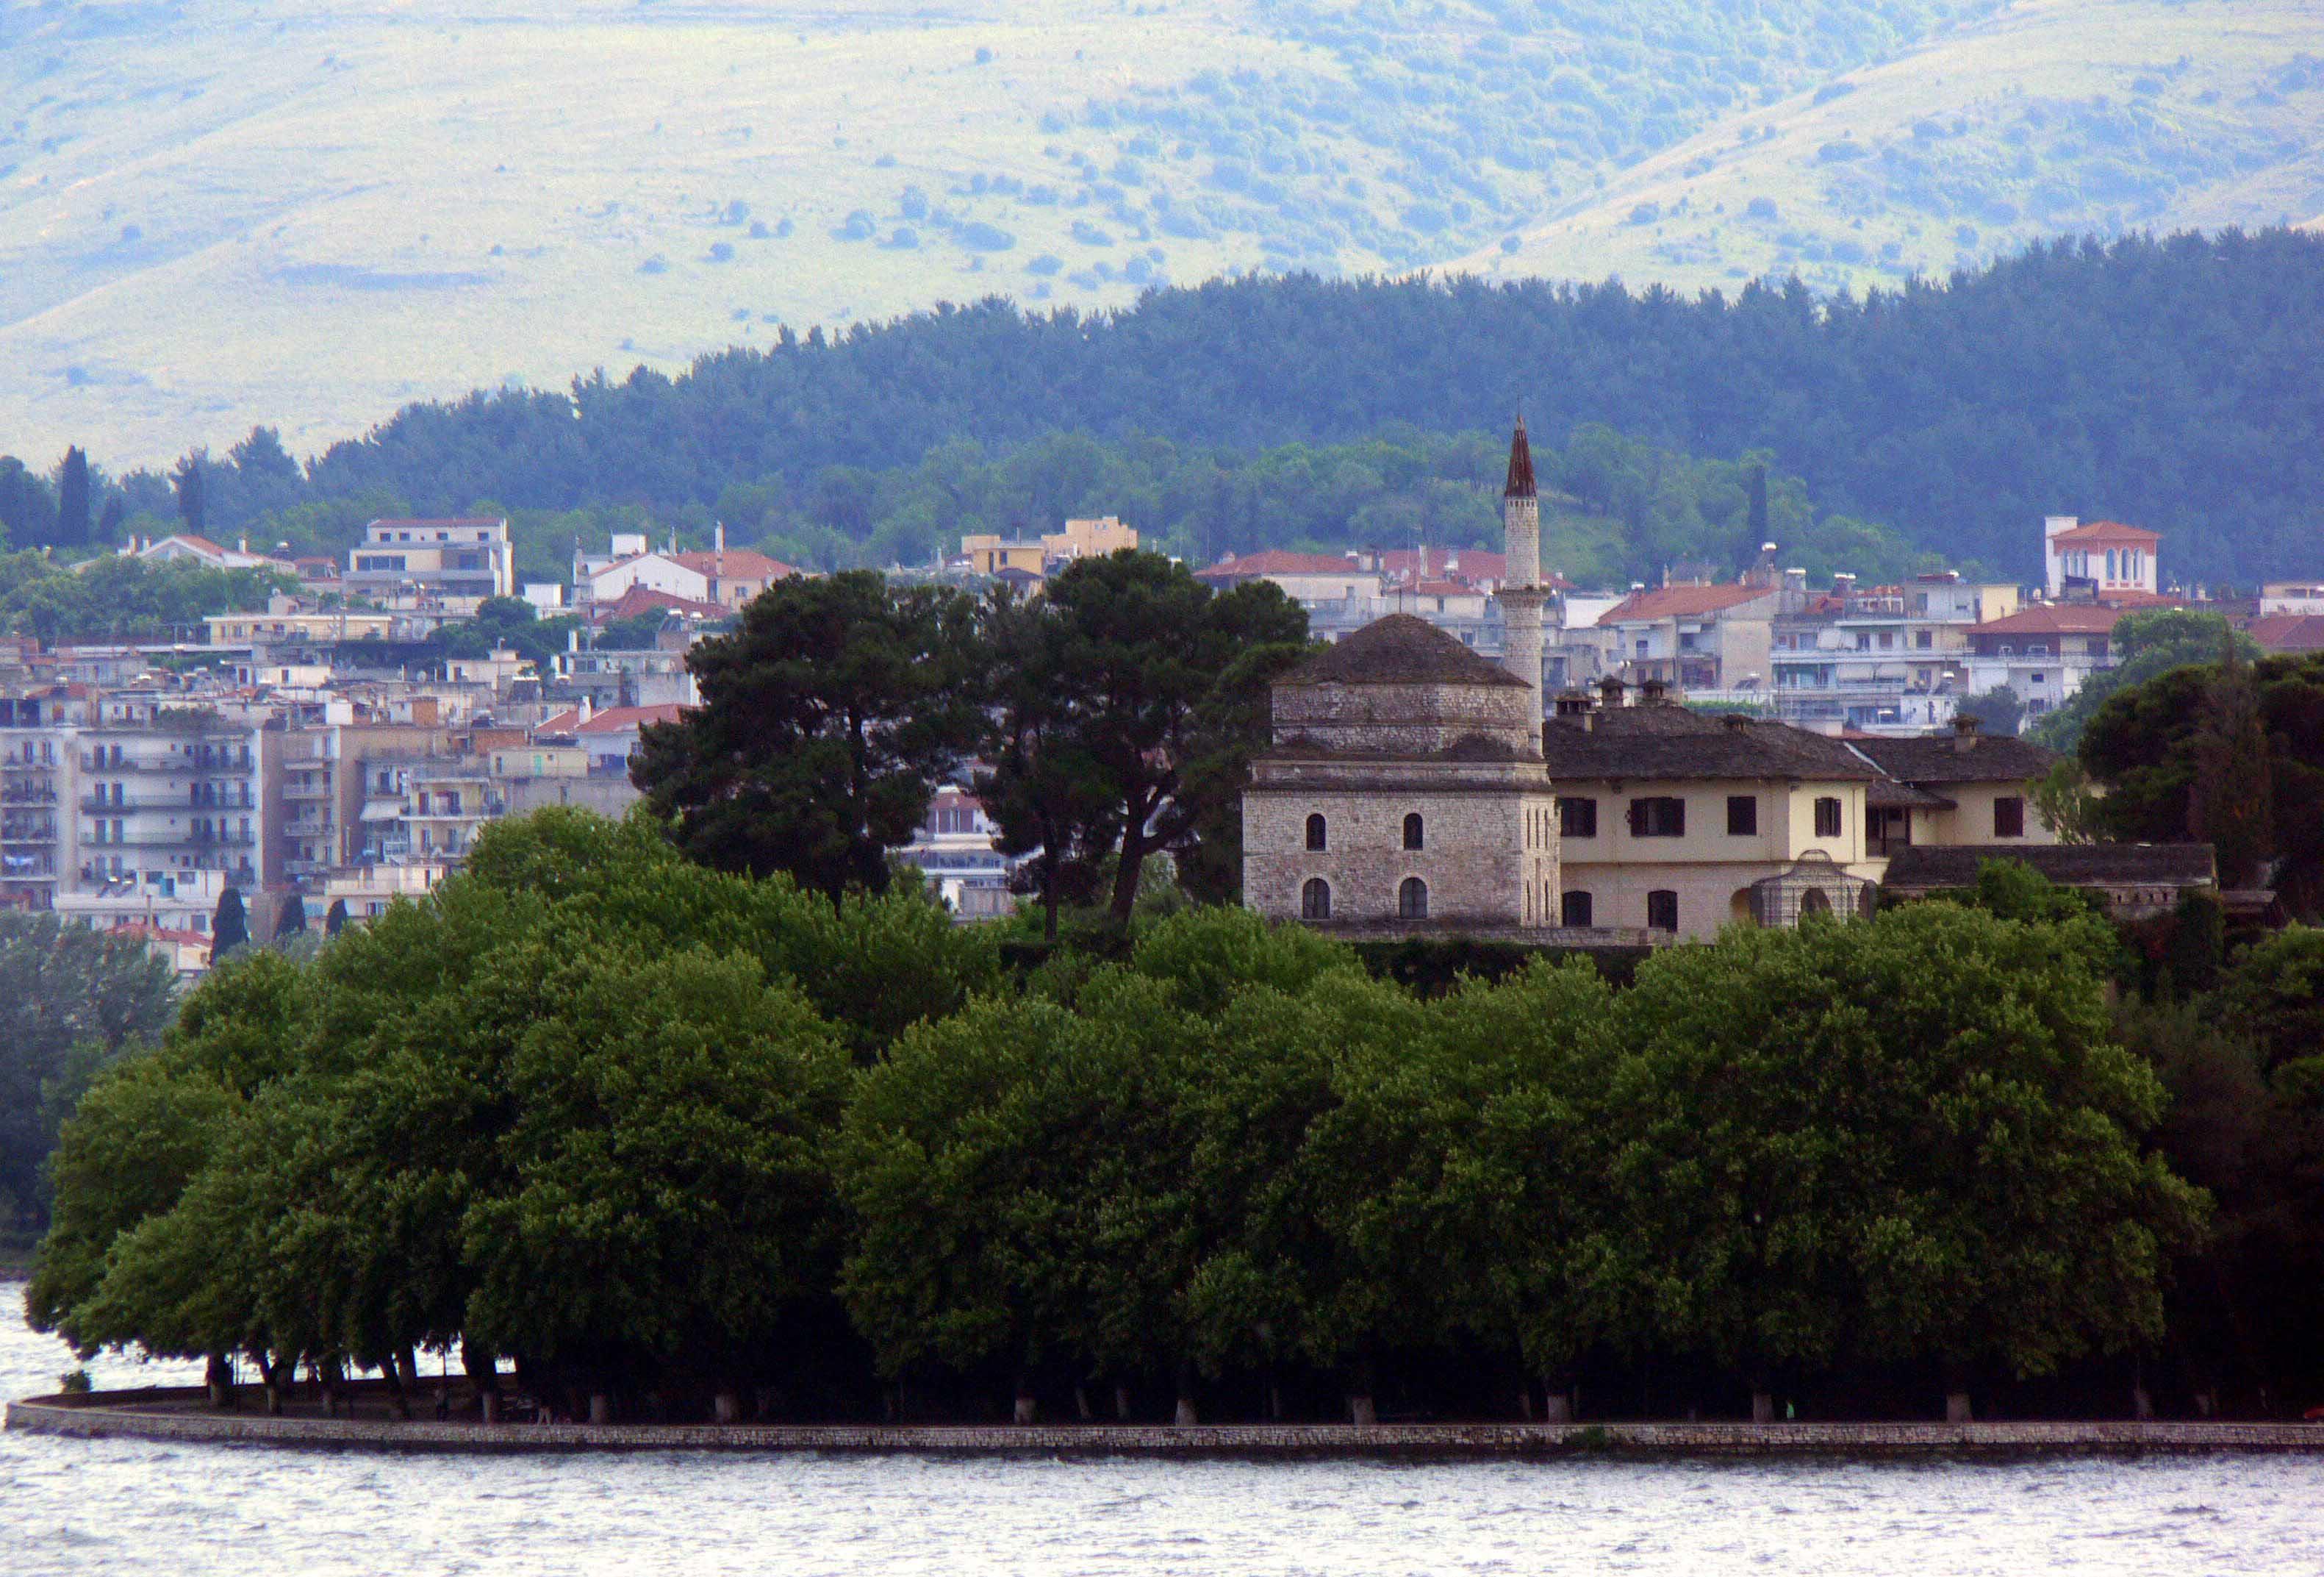 Ioannina Greece  City pictures : Original file  3,162 × 2,145 pixels, file size: 547 KB, MIME type ...